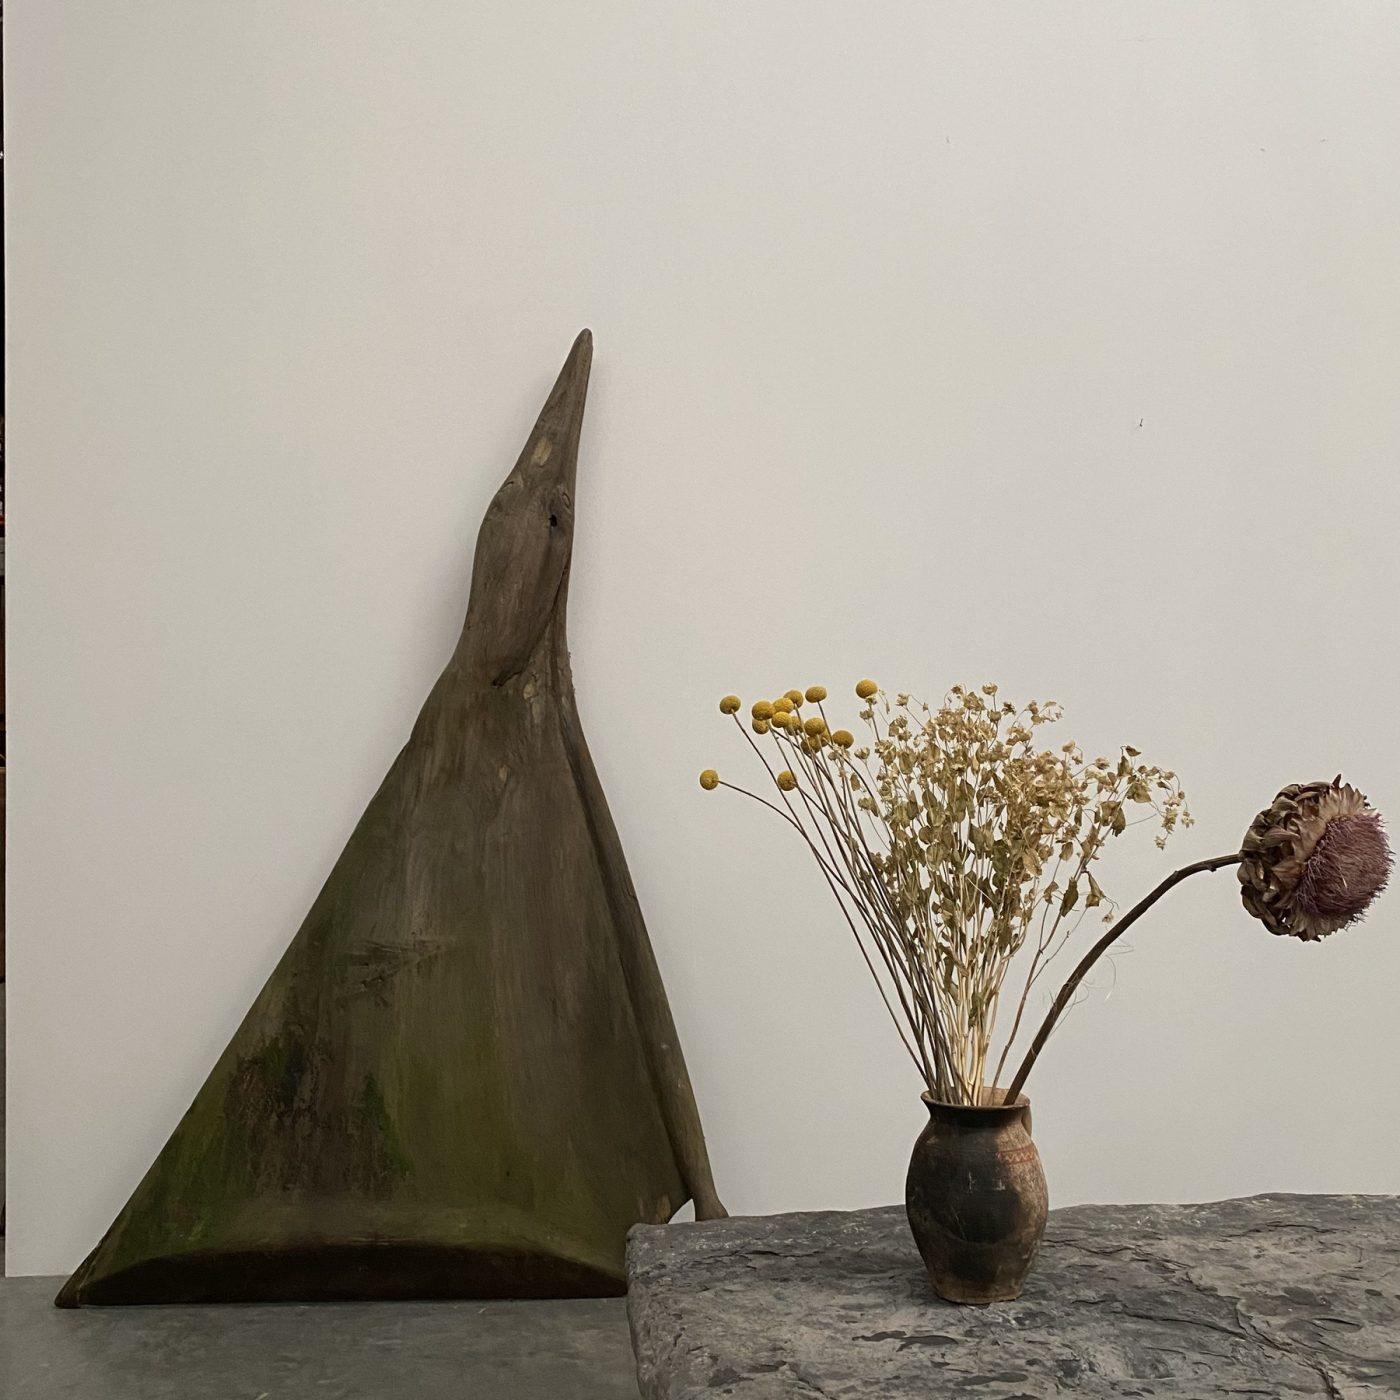 objet-vagabond-wooden-sculpture0002